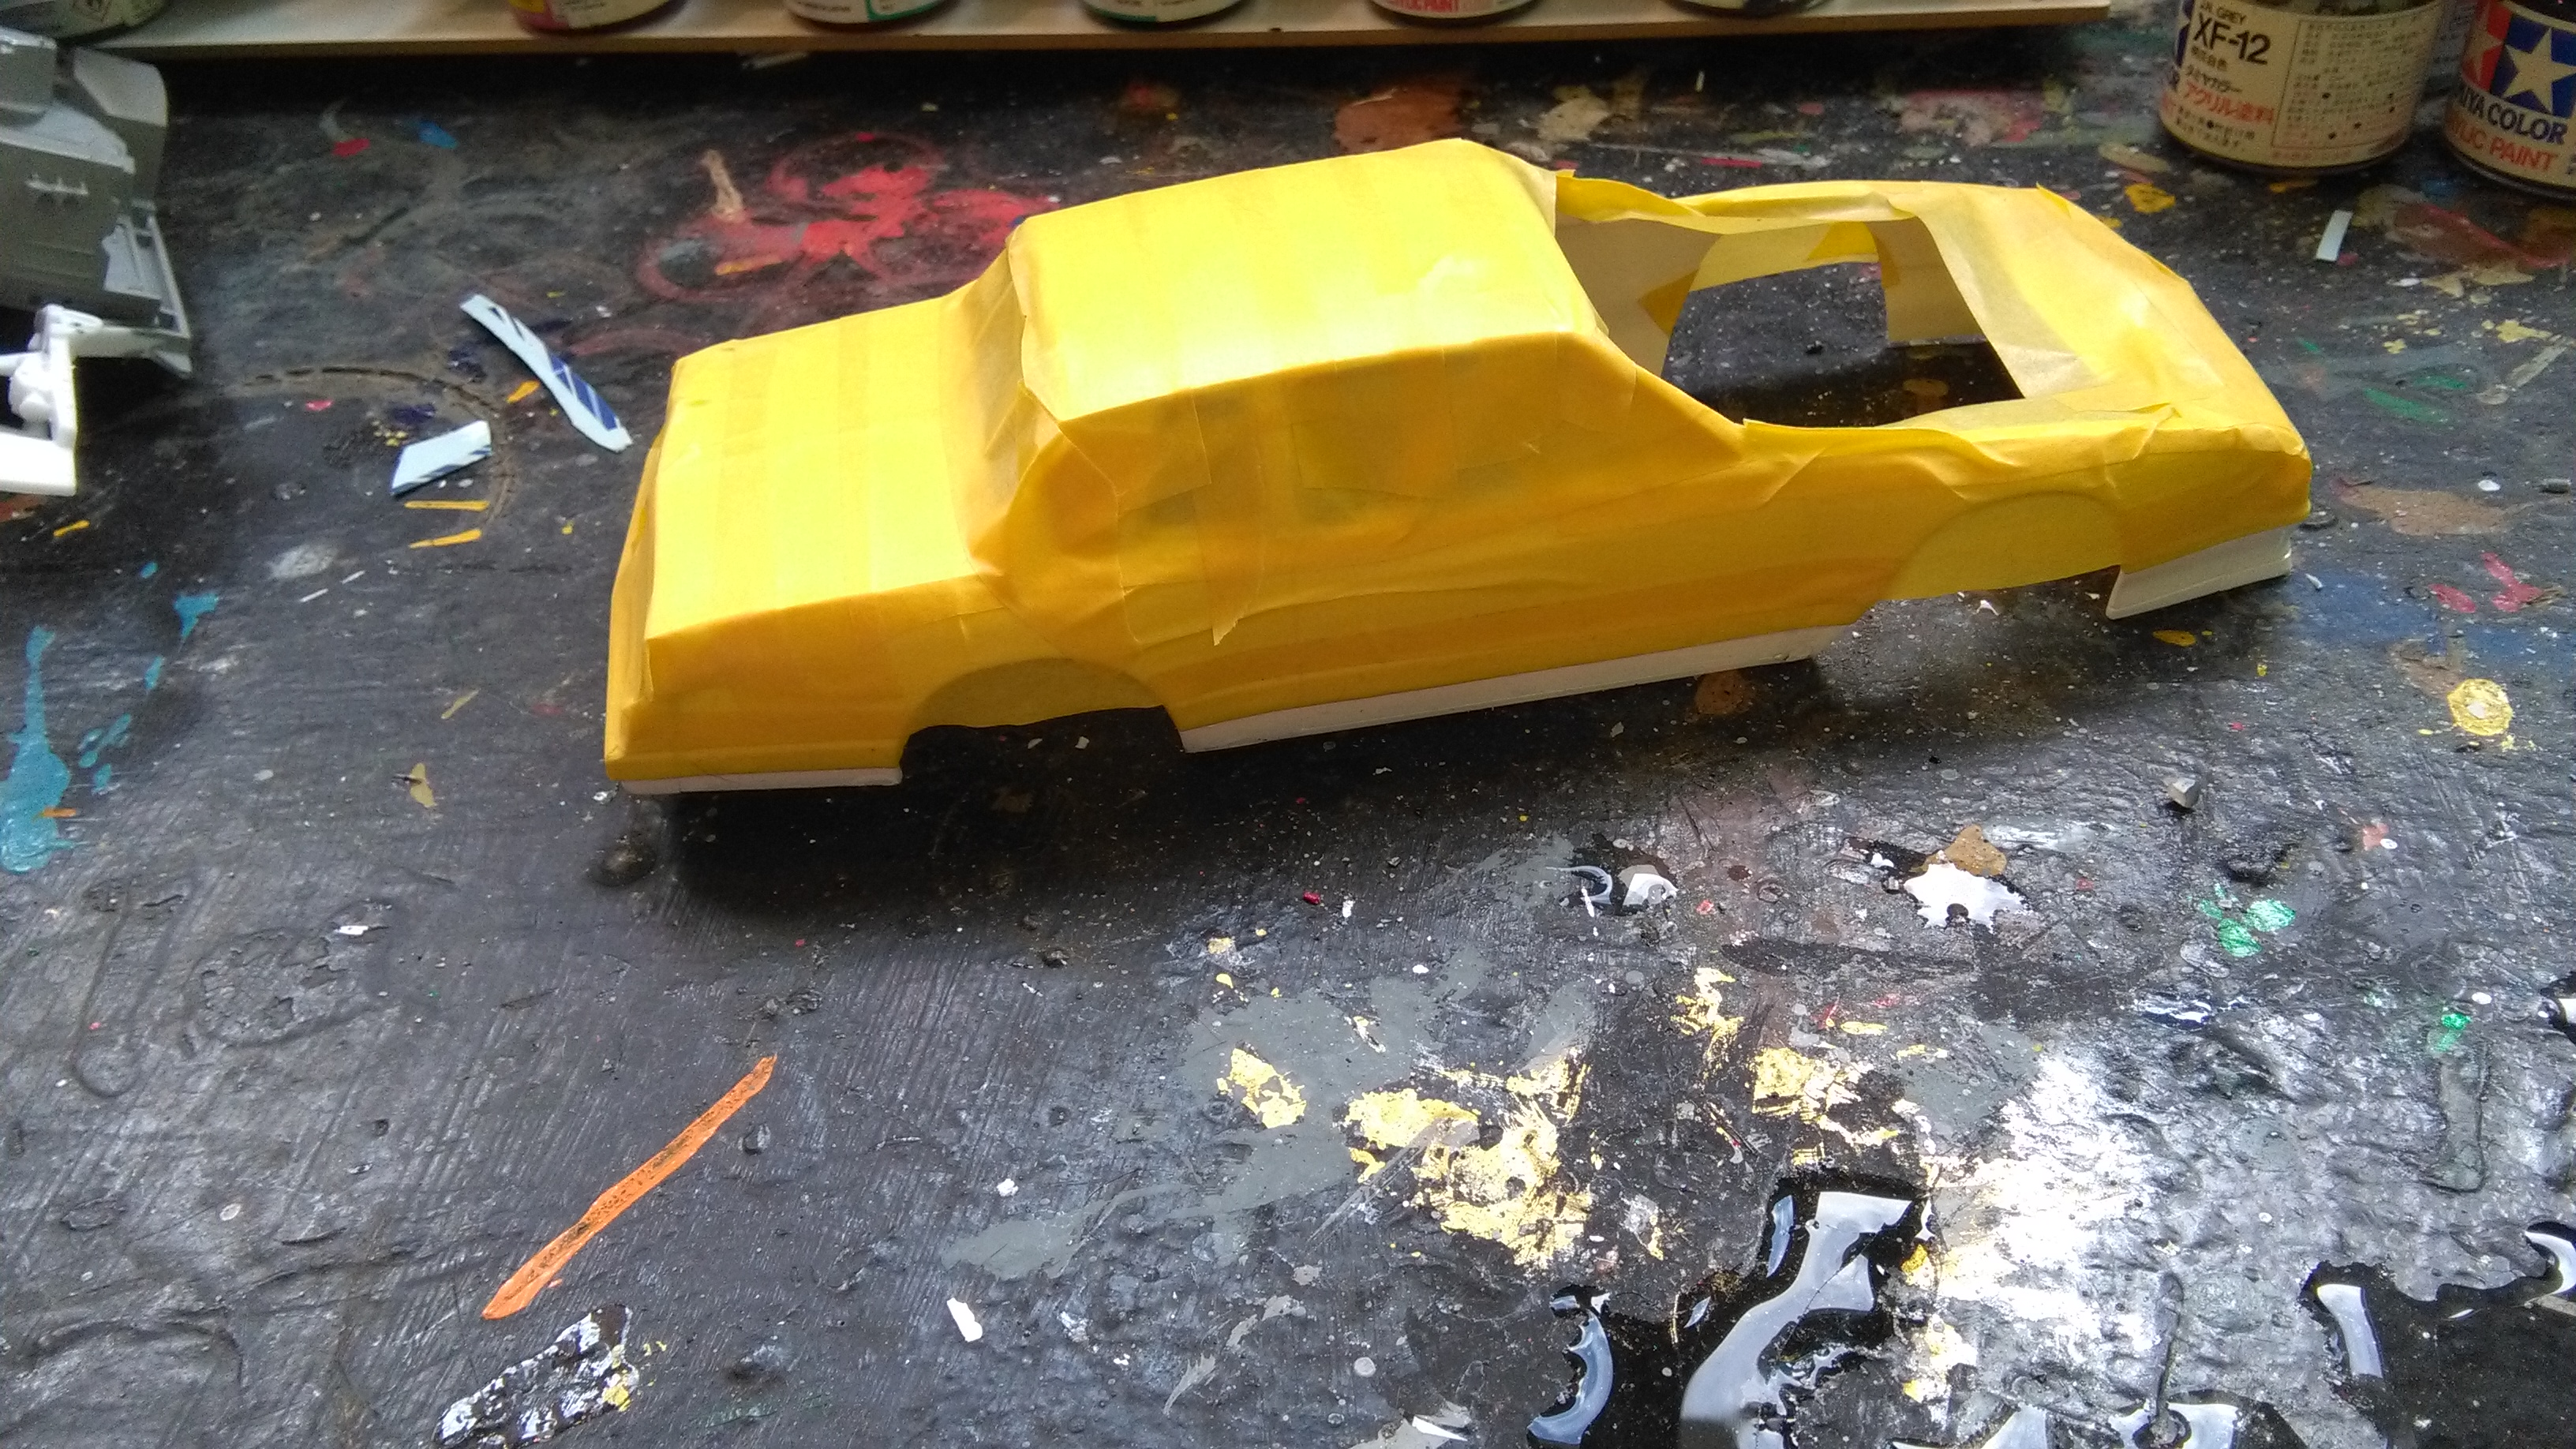 Chevy Monte-Carlo 1983 #11 Darrell Waltrip Pepsi  356165IMG20170428171612